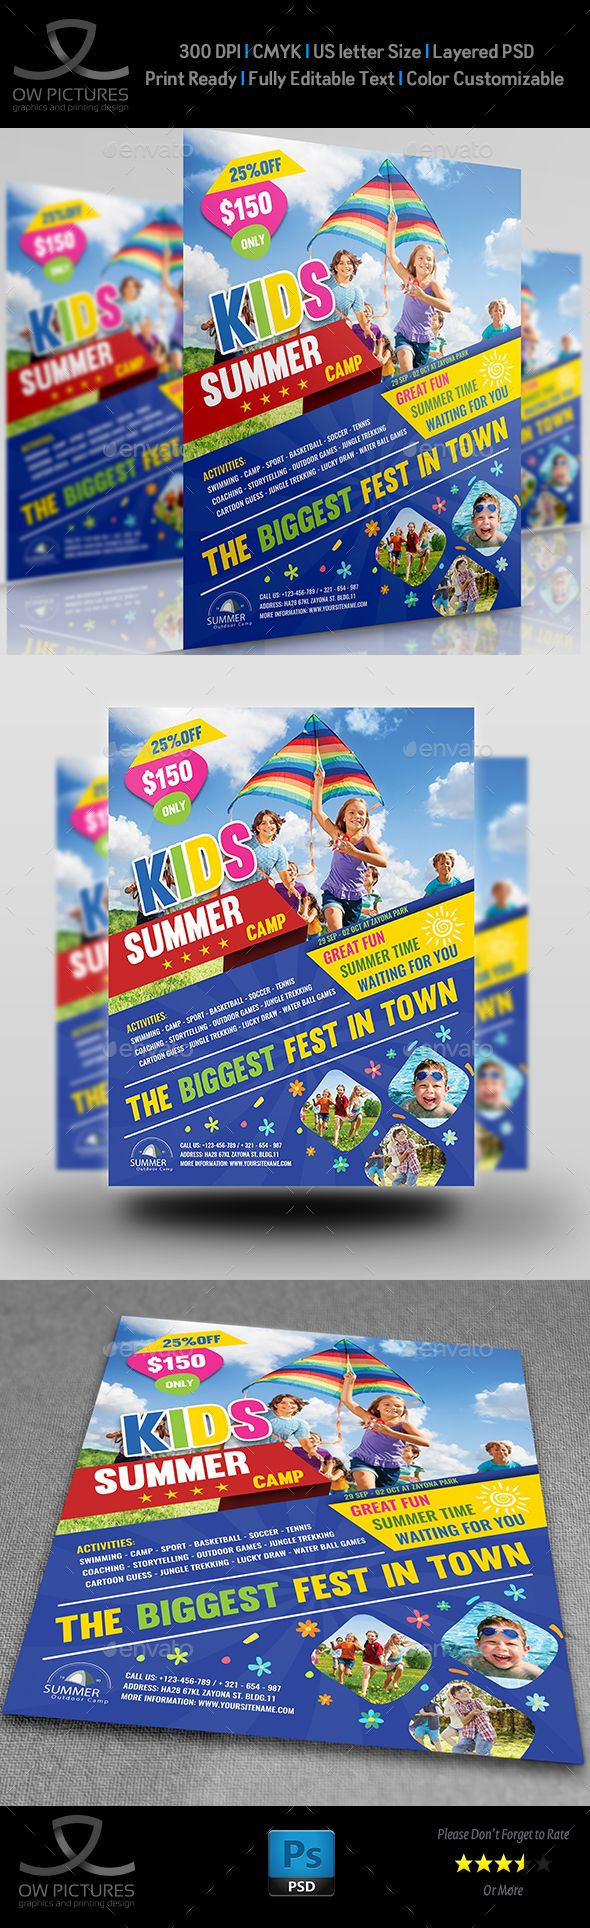 Kids Summer Camp Flyer Template PSD. Download here: https://graphicriver.net/item/kids-summer-camp-flyer-template/17017261?ref=ksioks